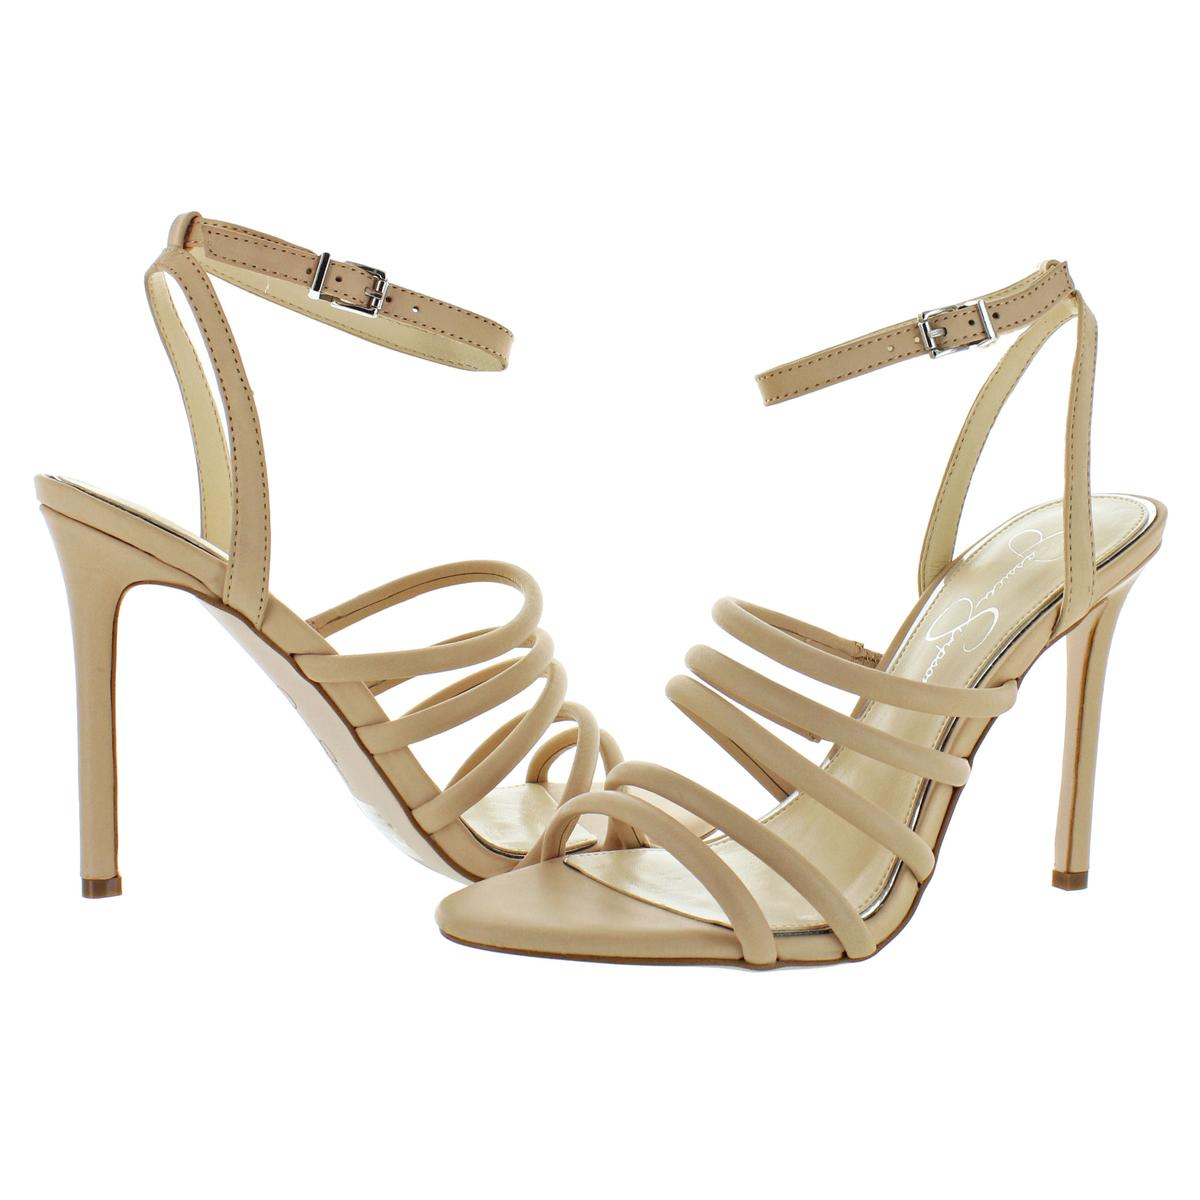 Jessica-Simpson-Femme-Joselle-a-Lanieres-Talon-Haut-Robe-Sandales-Chaussures-BHFO-7879 miniature 13